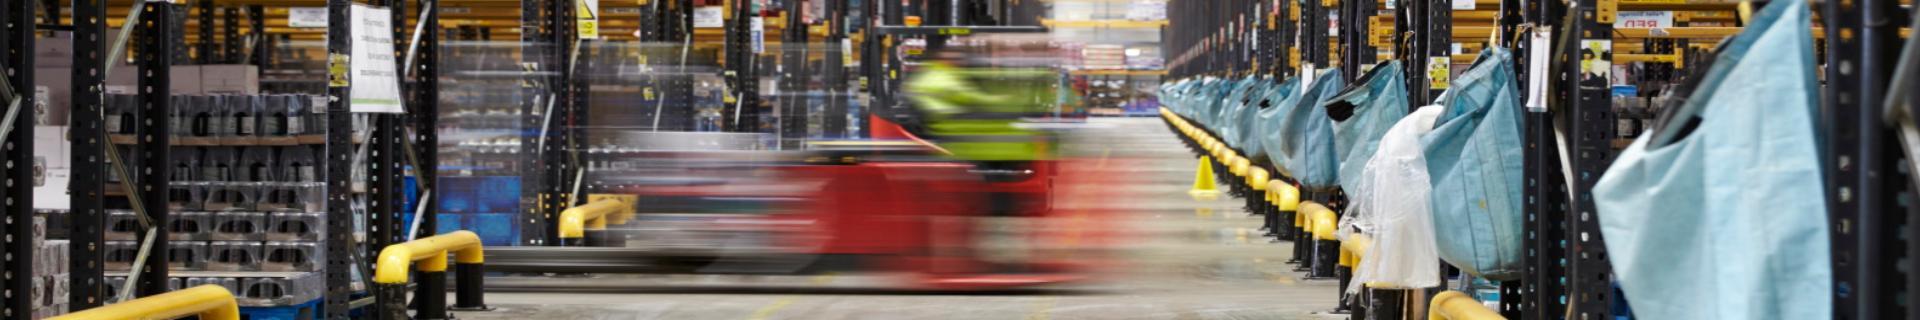 Forklift Training: Operating Procedures